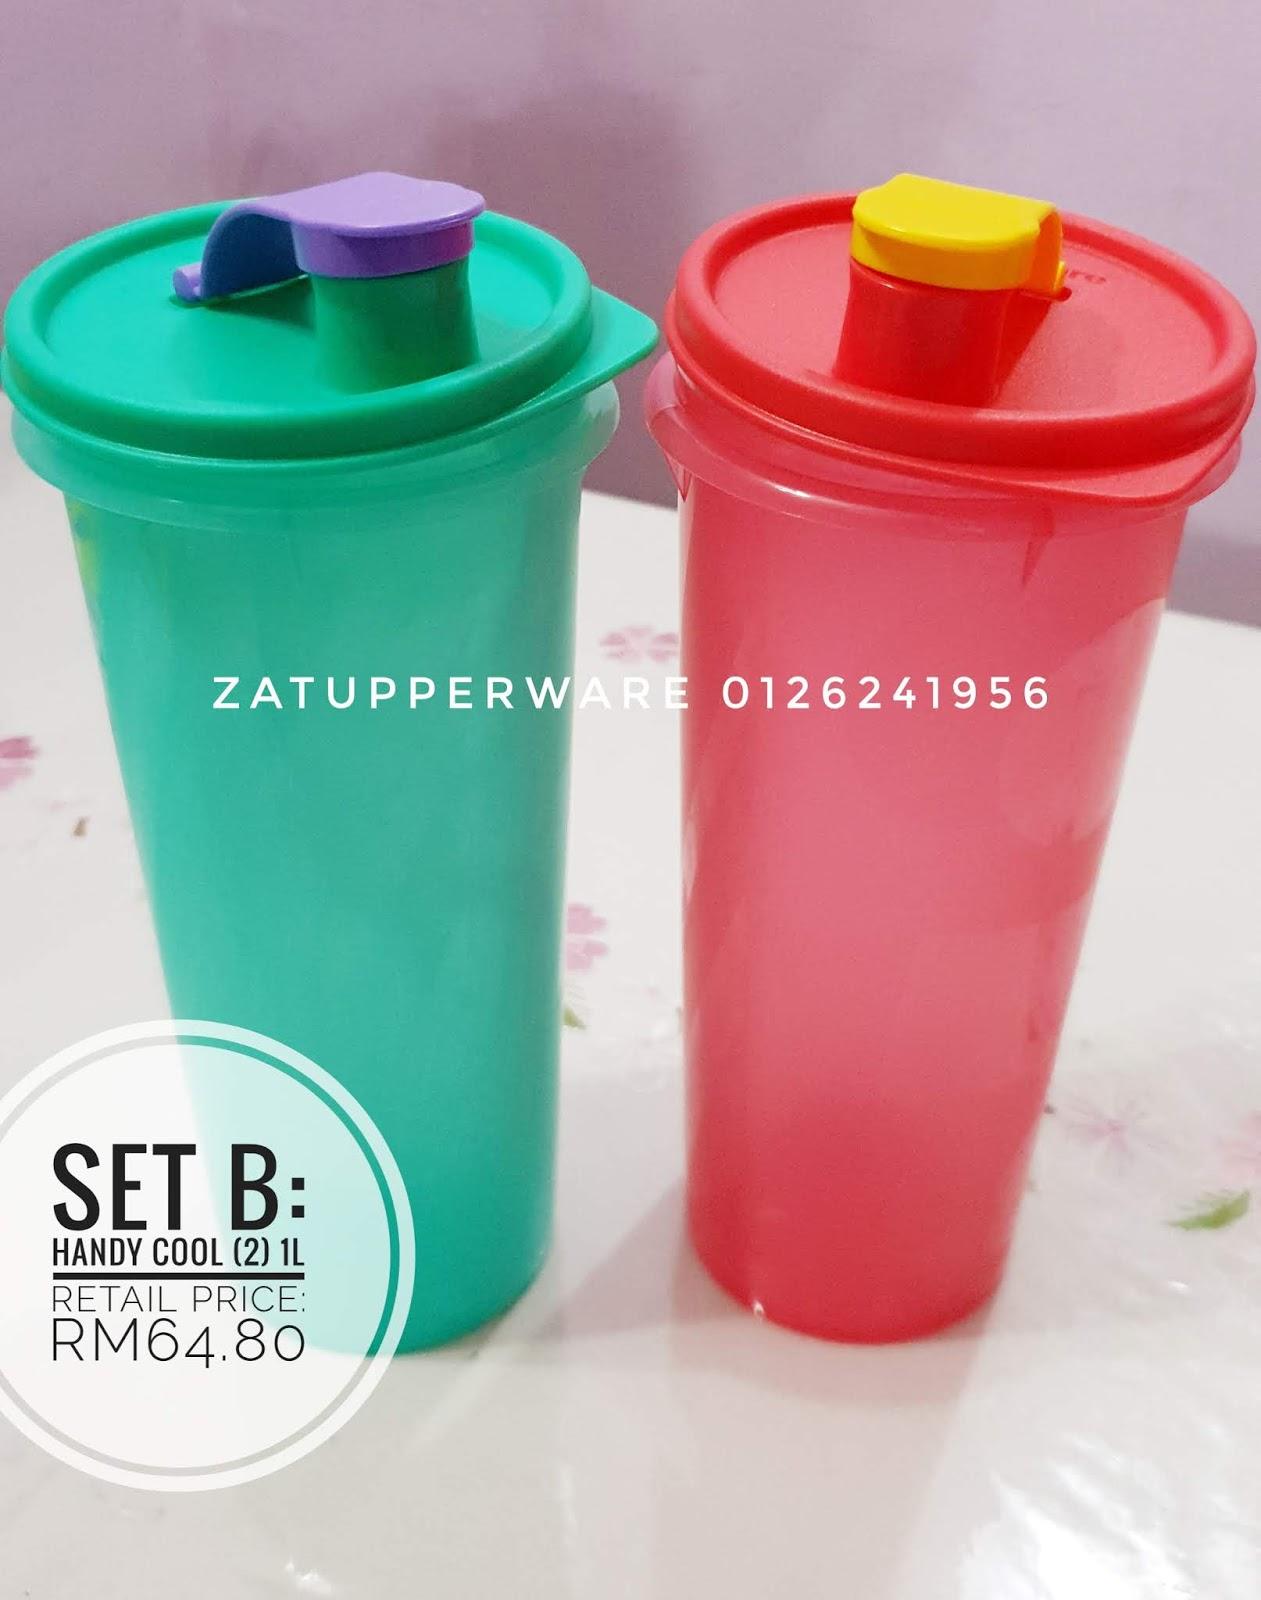 Za Tupperware Brands Malaysia : Clearance Stock